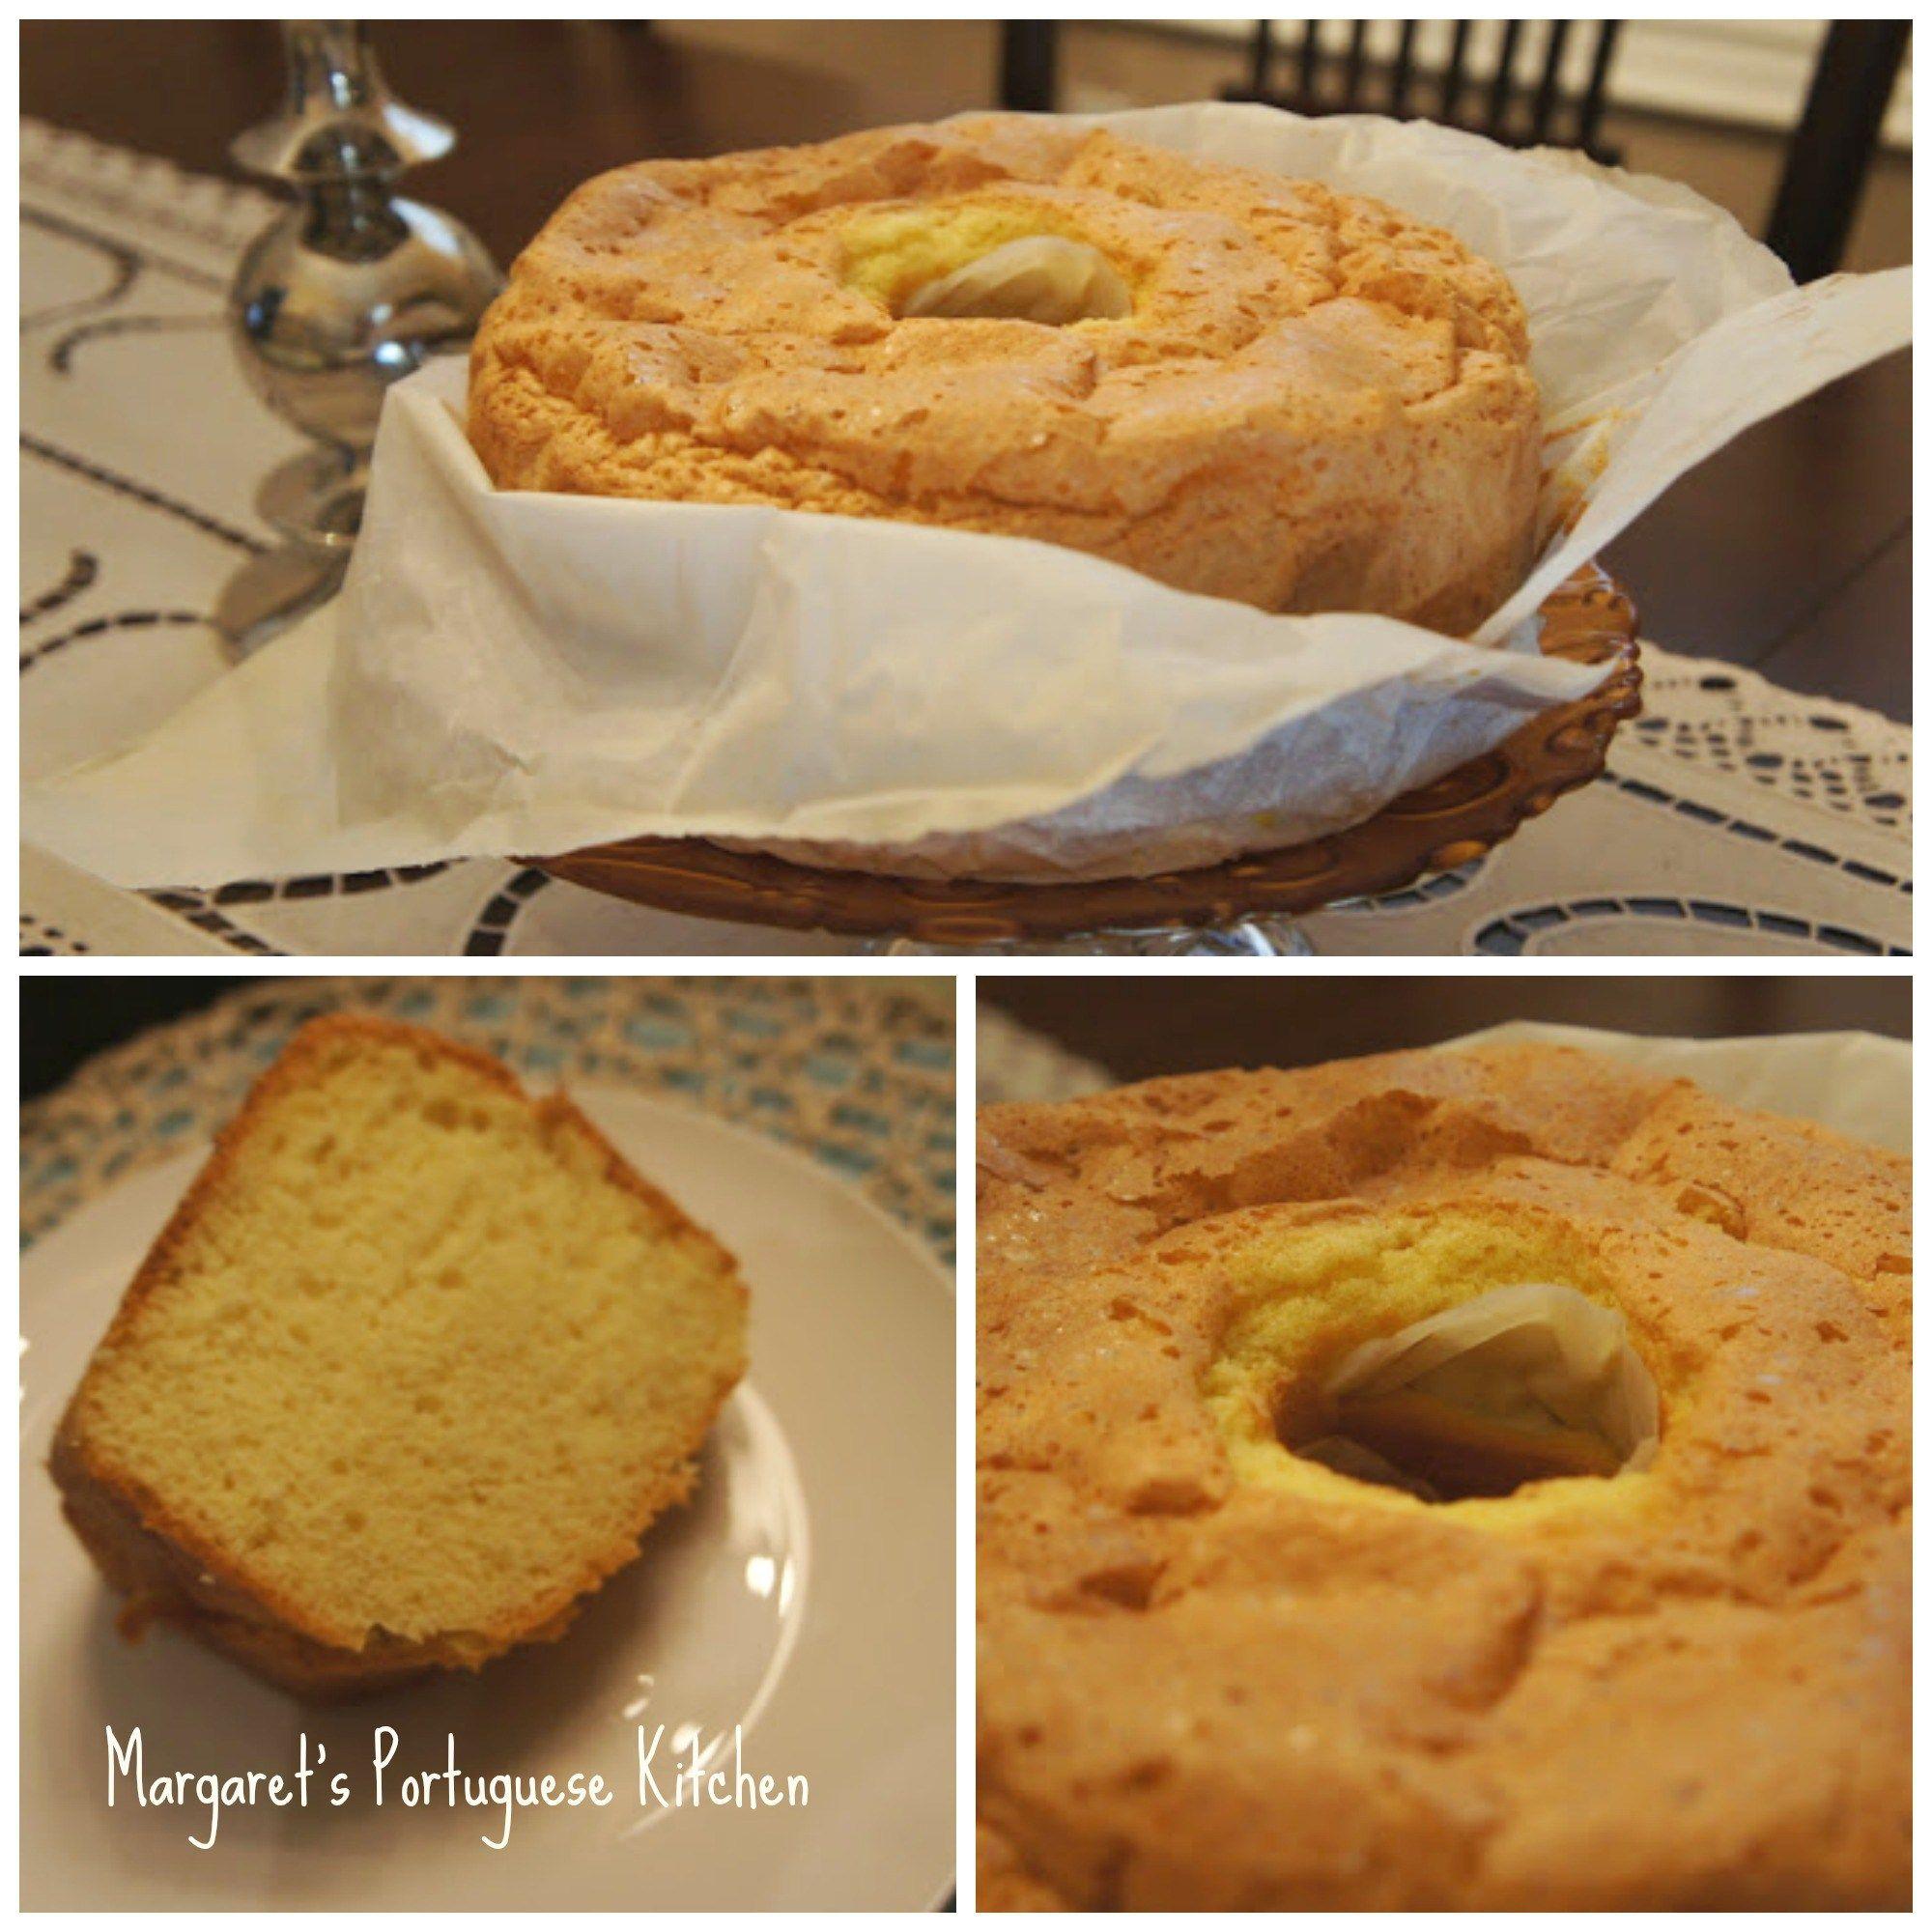 Pao de lo Portuguese Sponge Cake